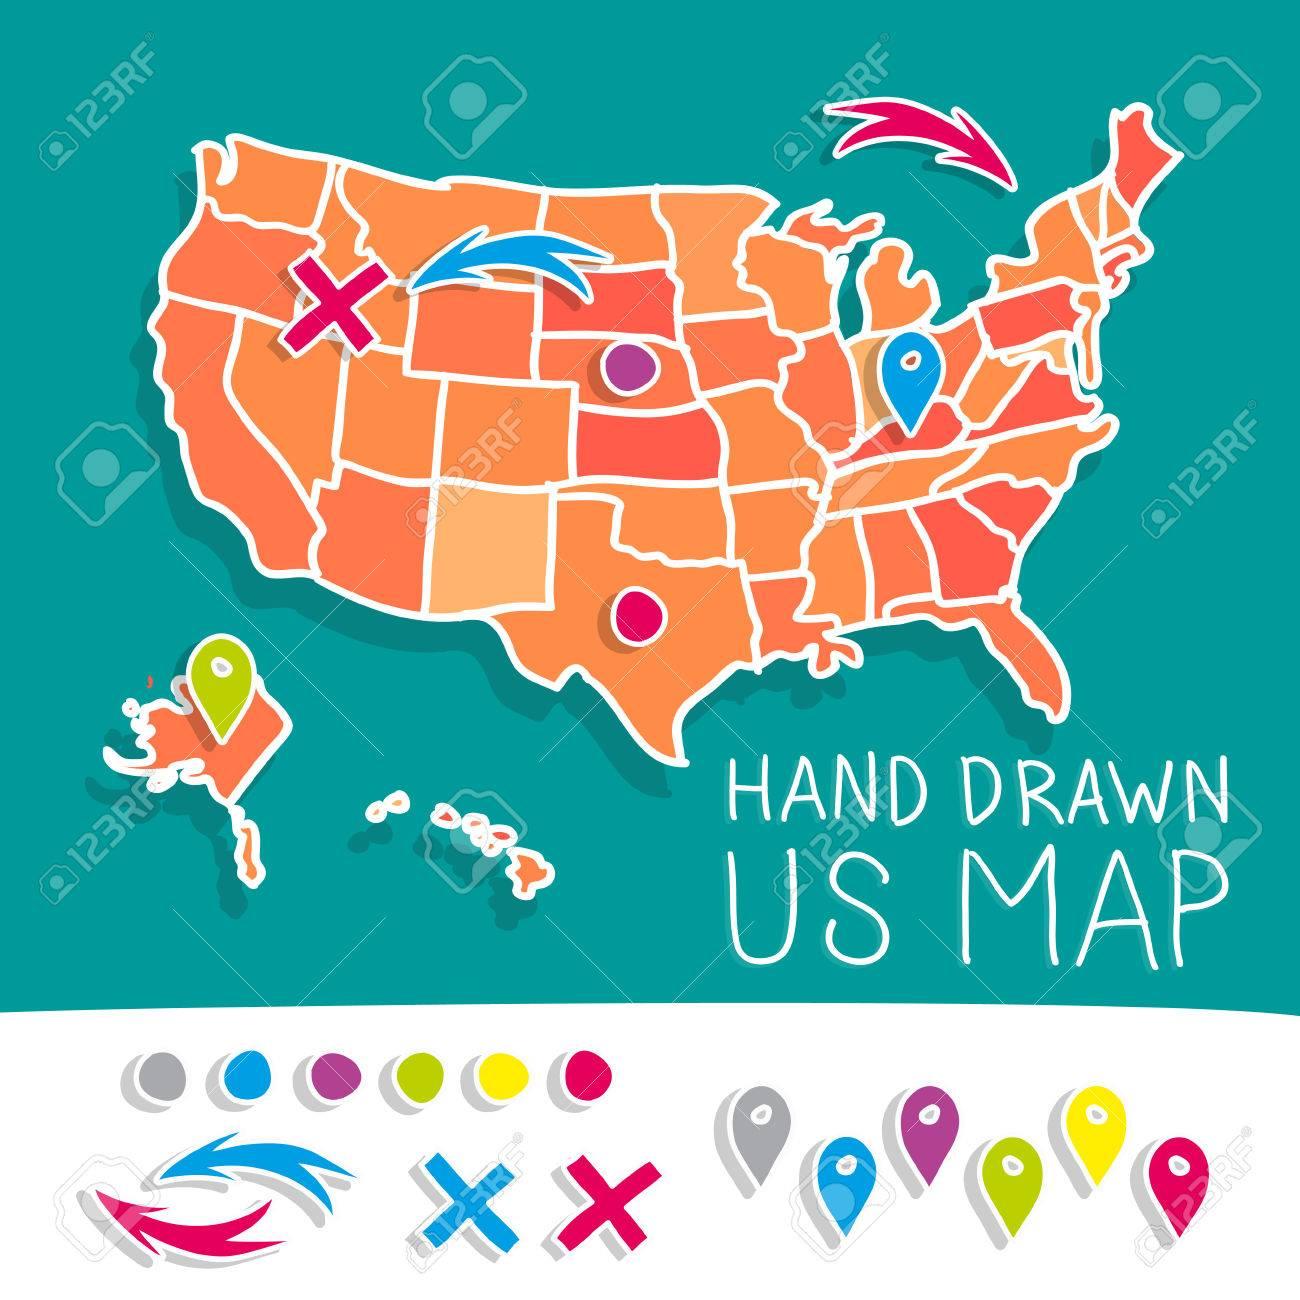 Hand Drawn US Map Vector Illustration Royalty Free Cliparts, Vectors ...